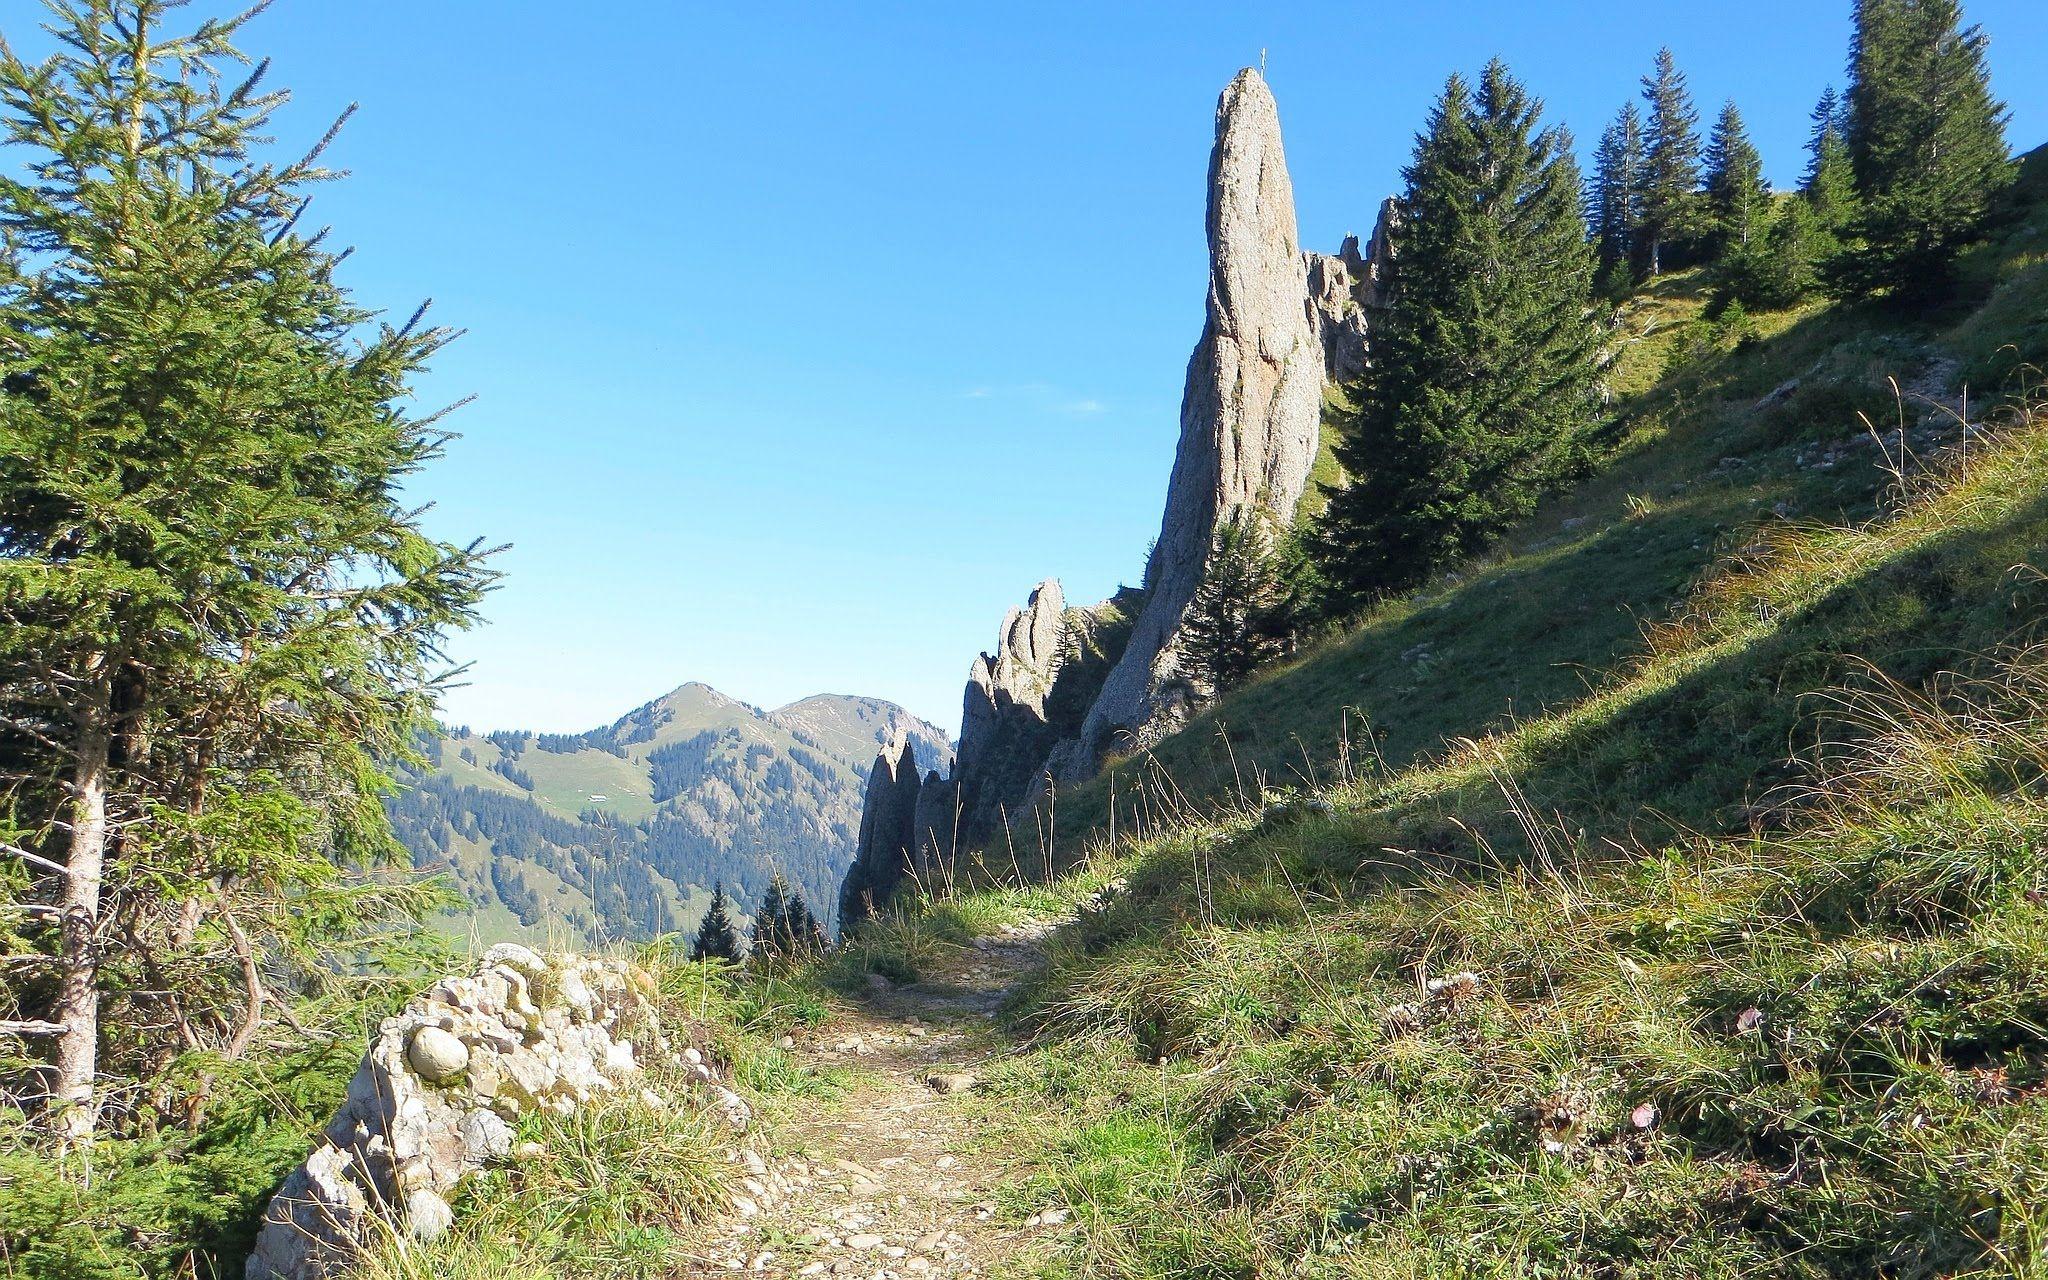 Allgäu Halbtagestouren Oberstdorf Sonthofen Hindelang